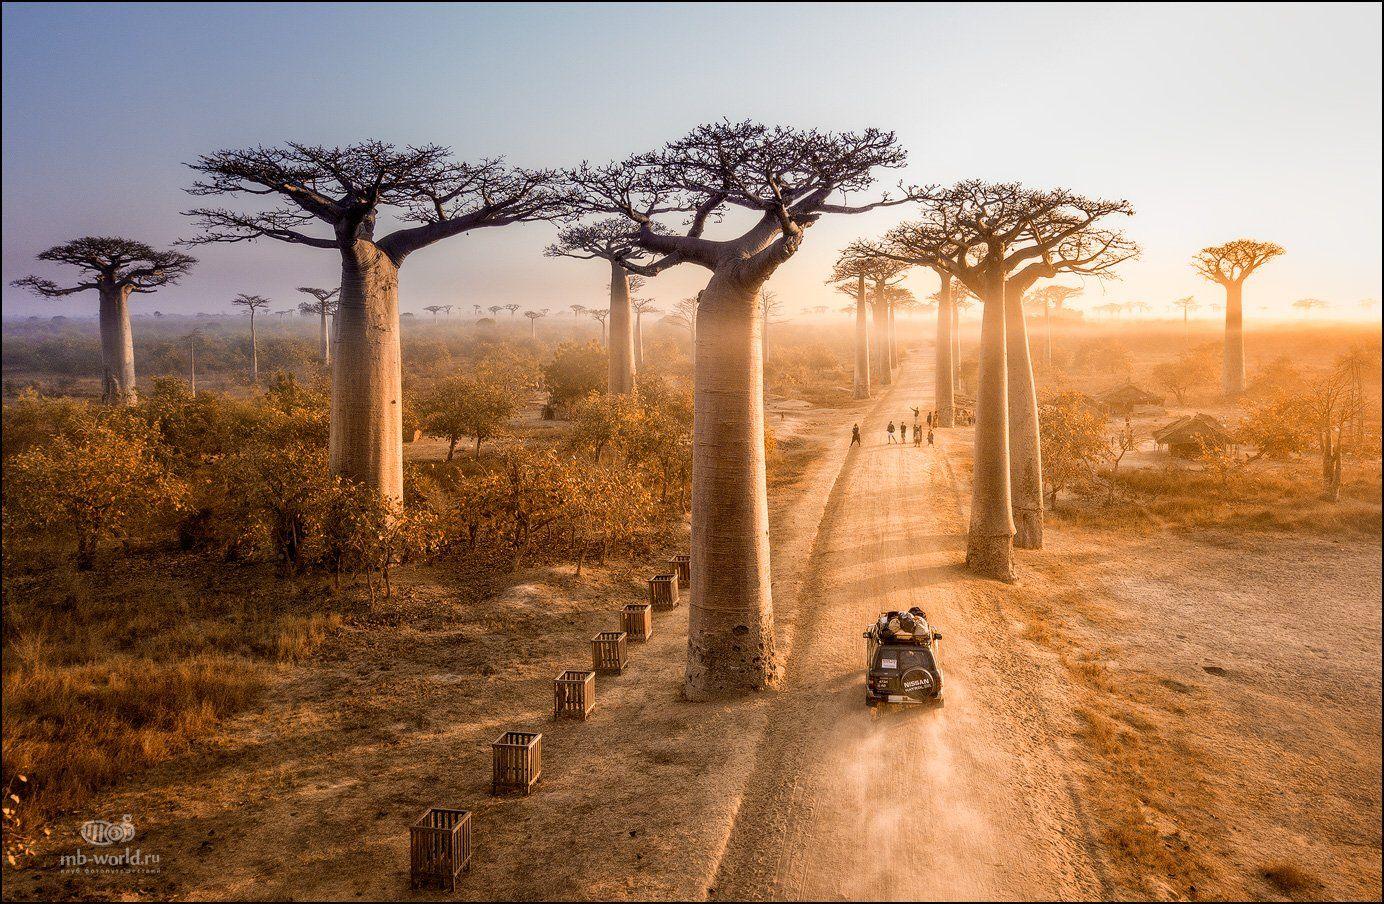 Мадагаскар, долина баобабов, путешествие, фототур, Михаил Воробьев